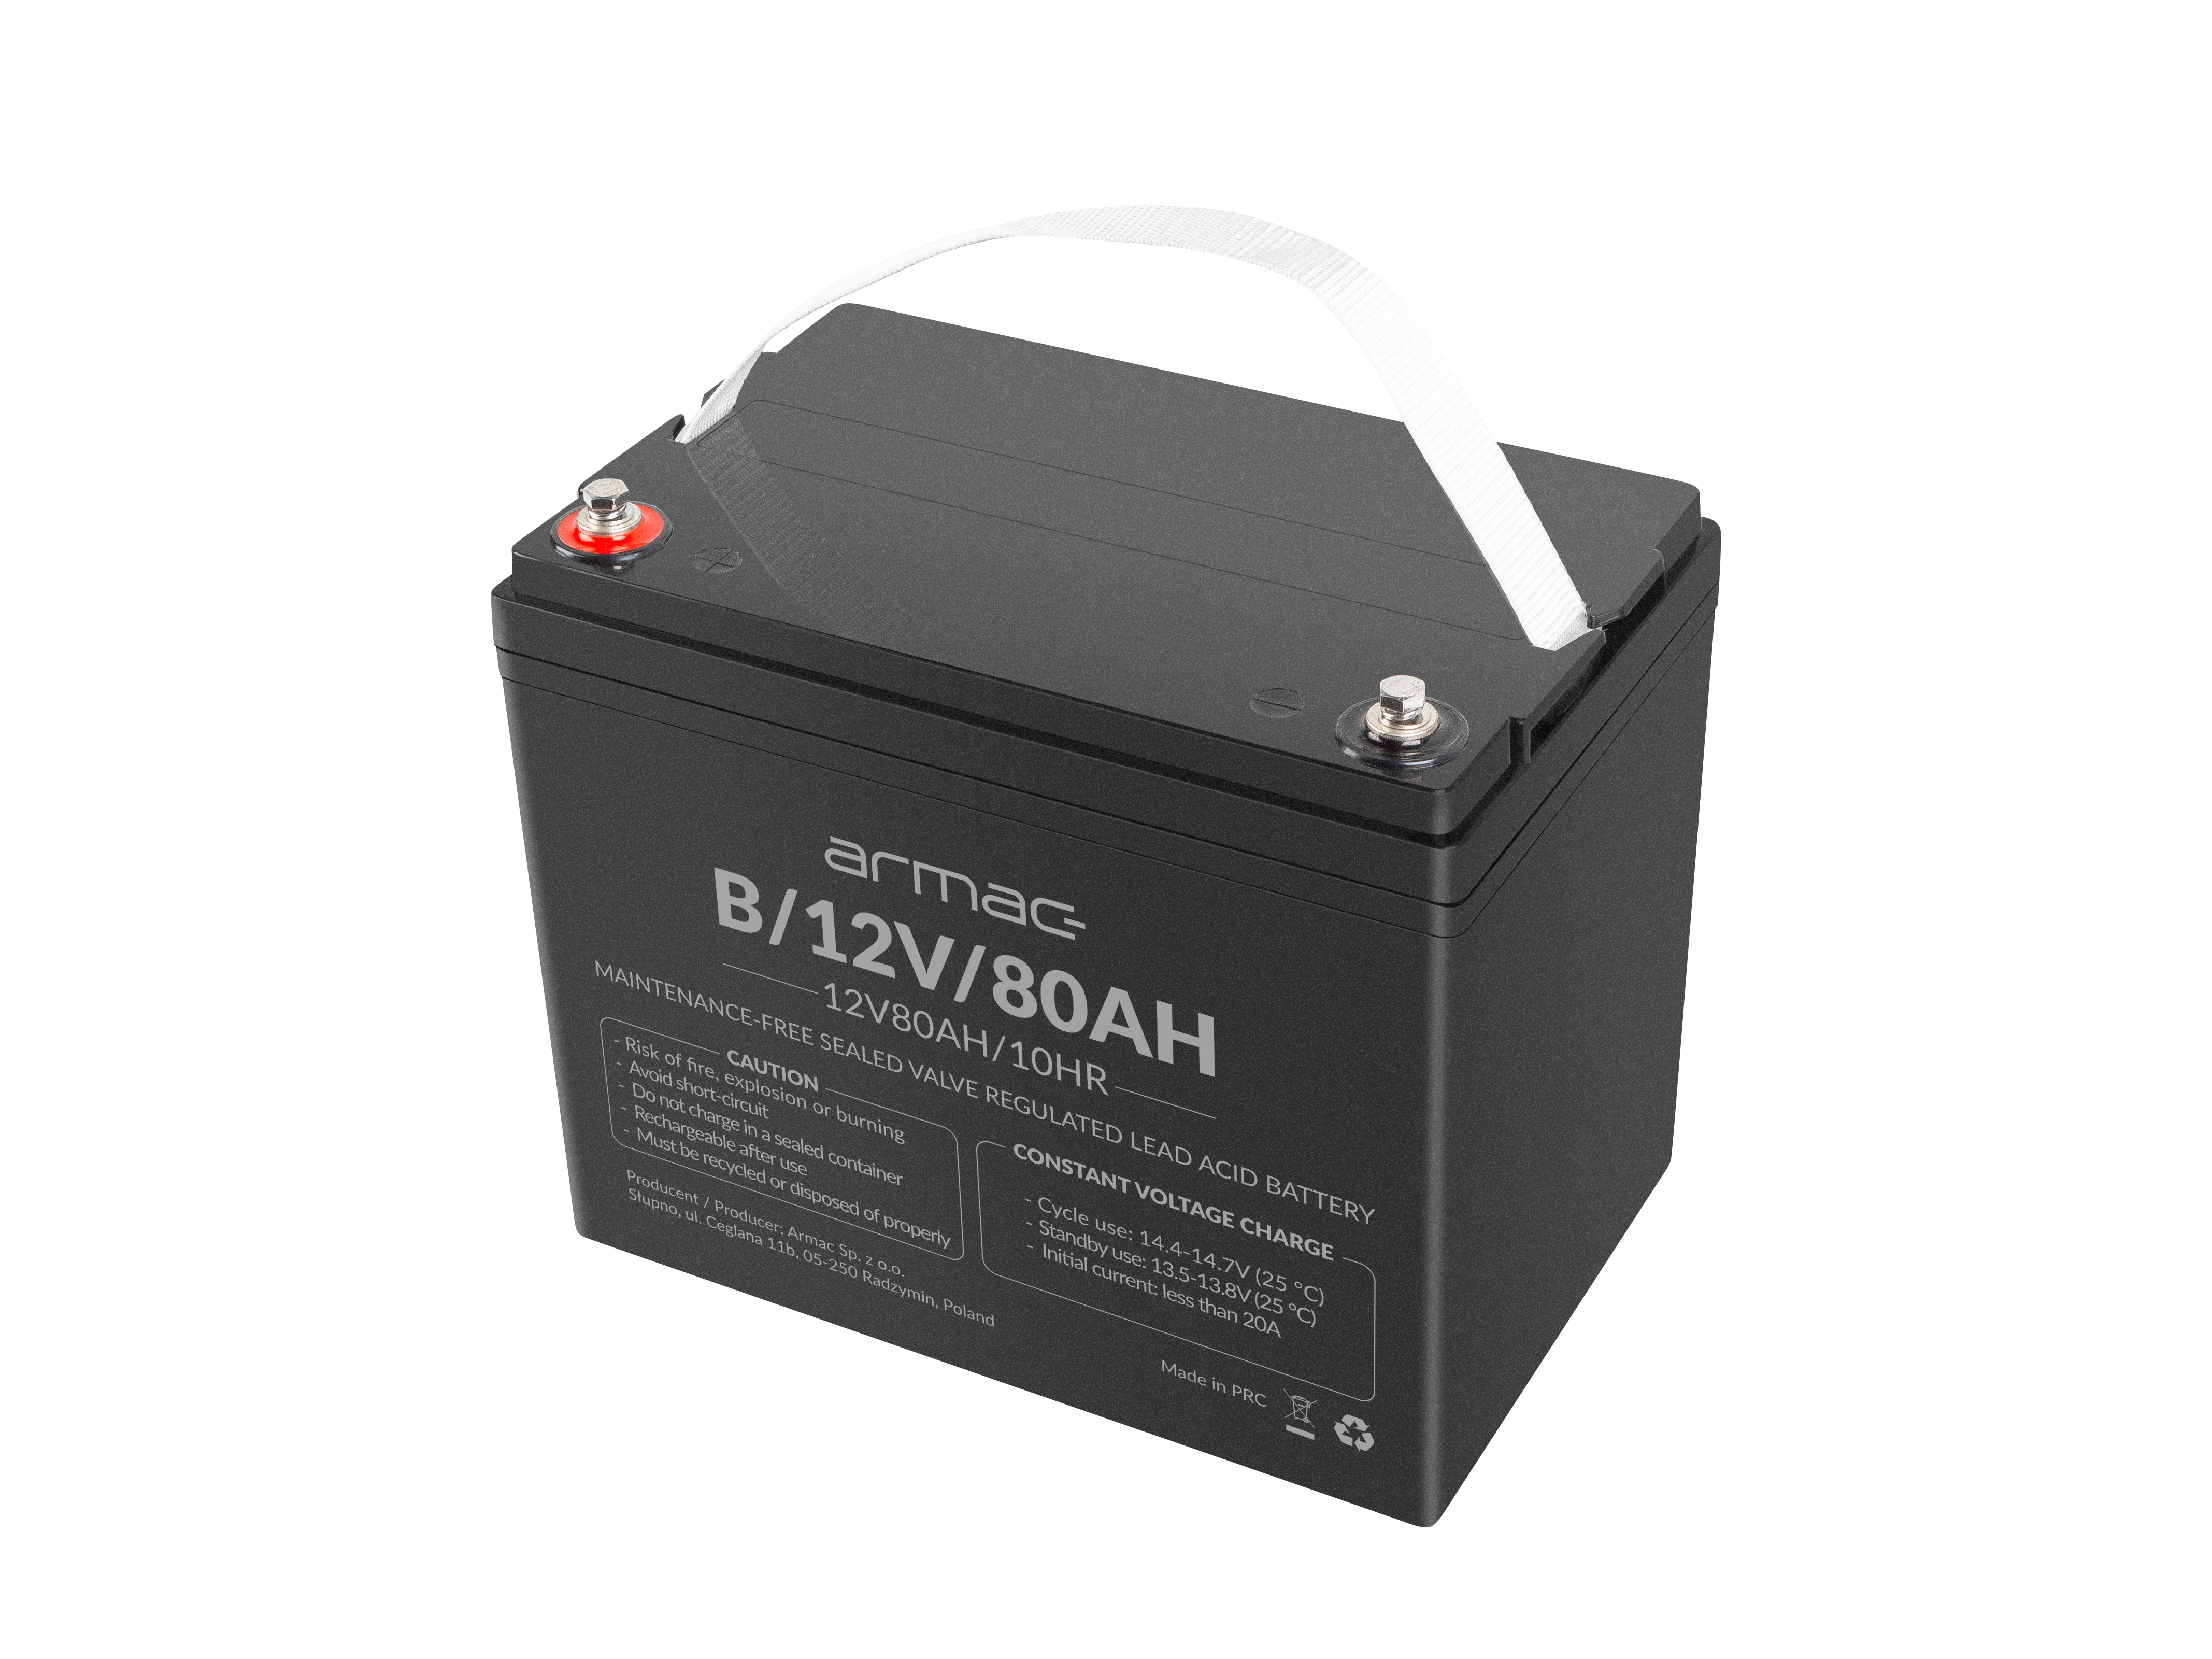 ups battery armac 12v/80ah 1